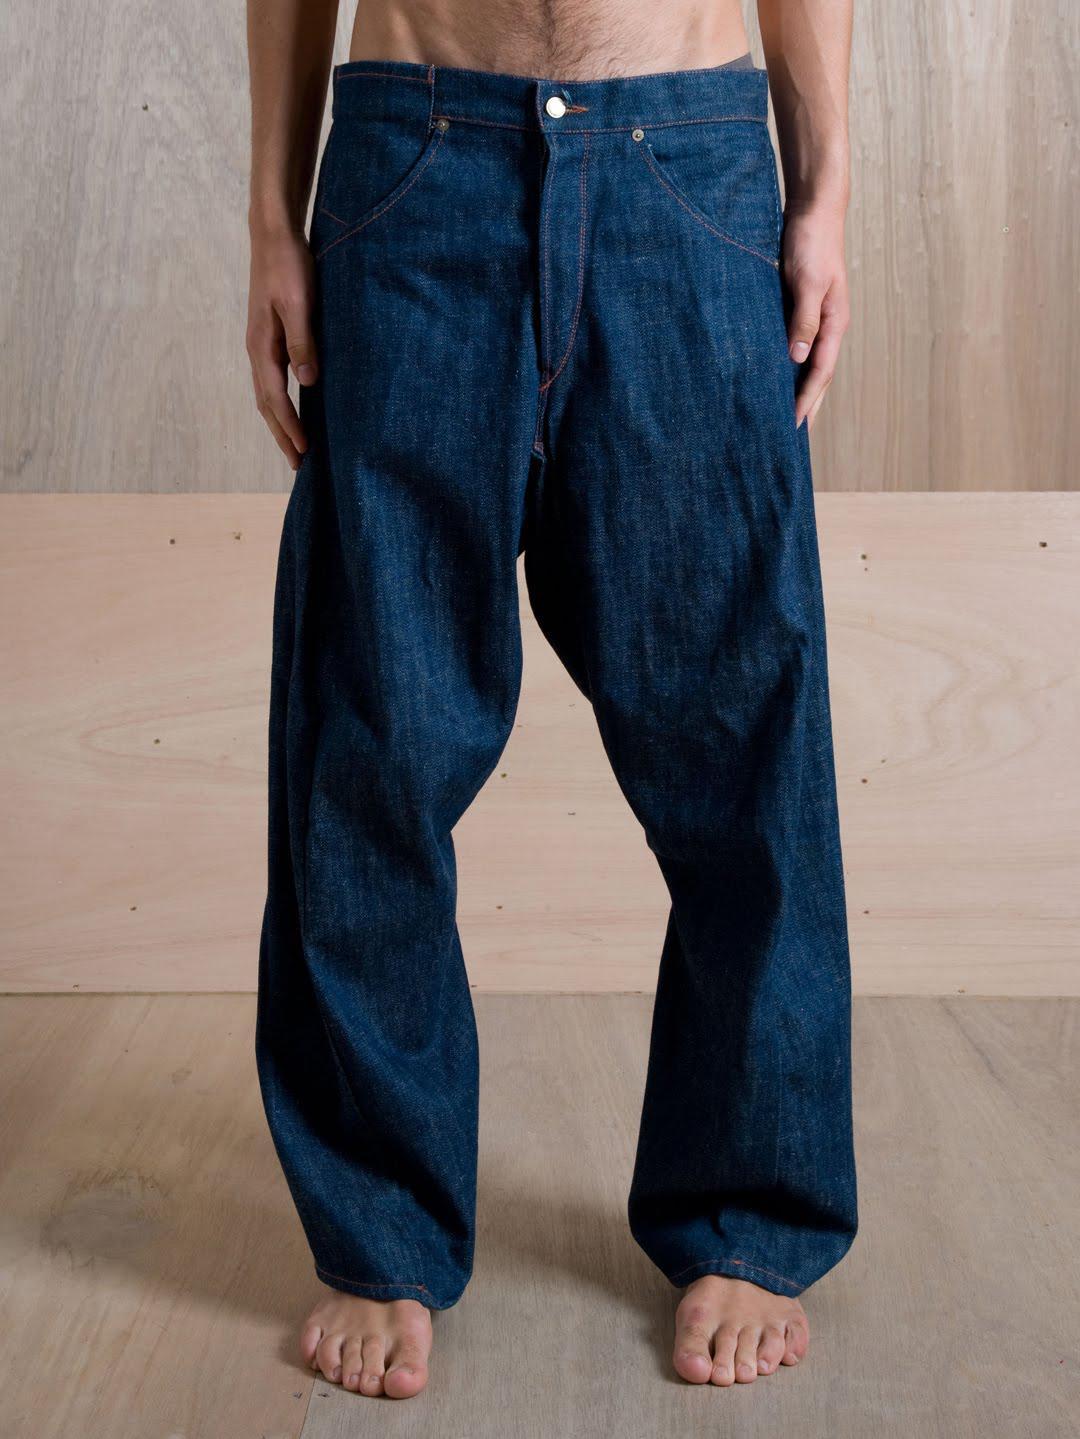 Levis Jean Jacket Vintage